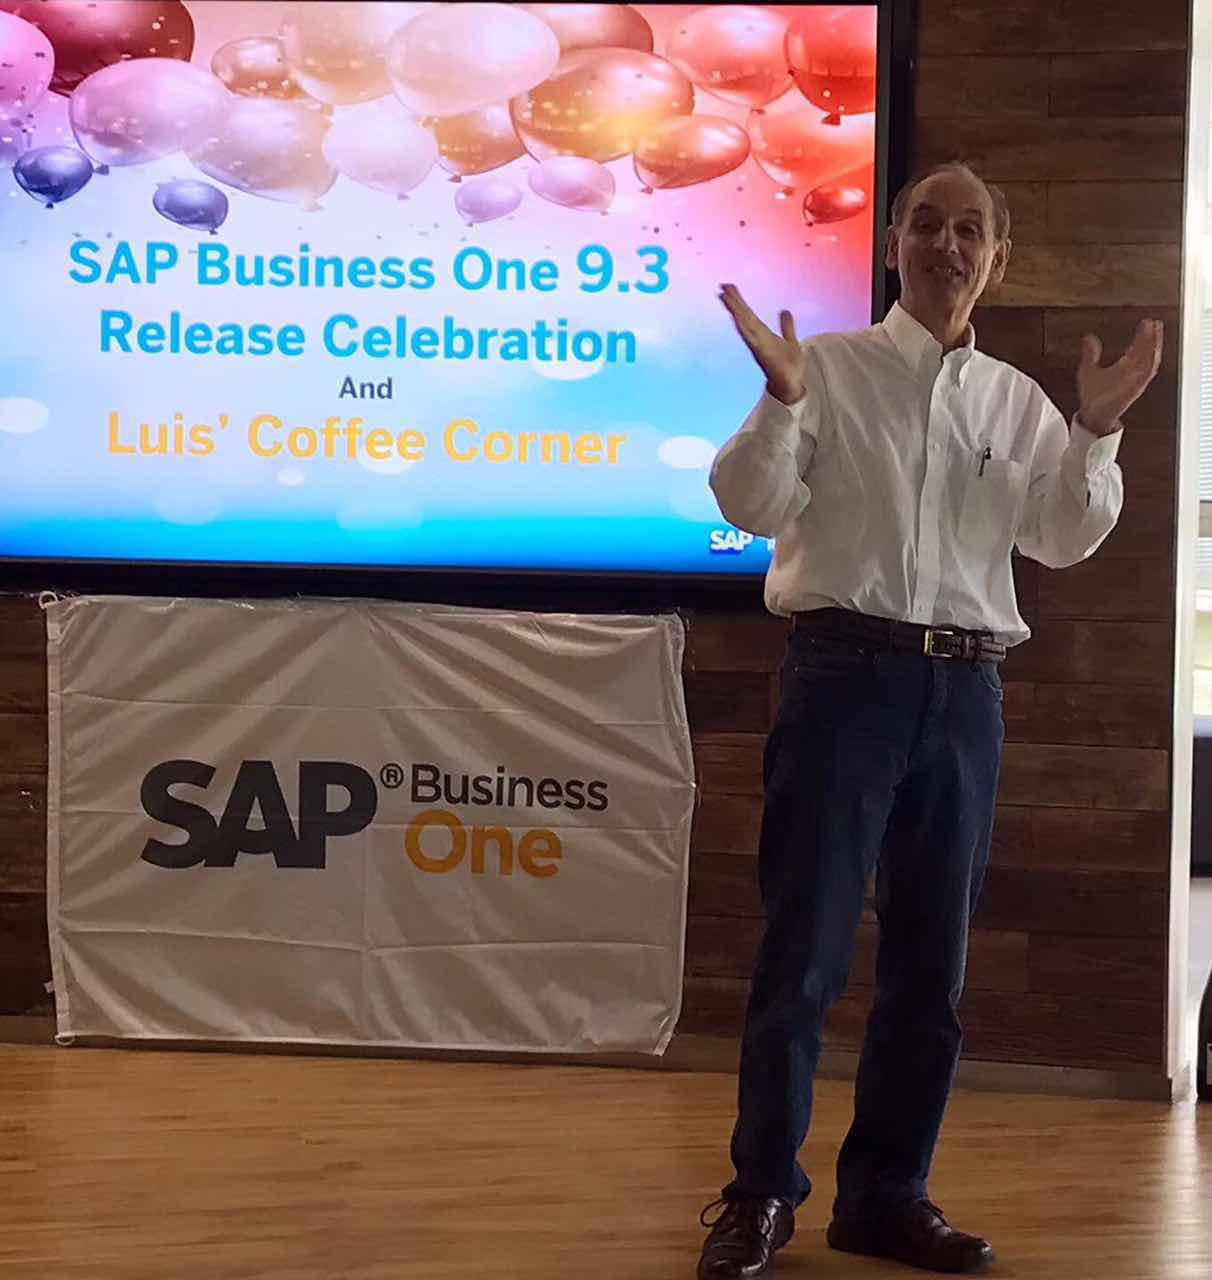 SAP_Business_one9.3_5.jpg